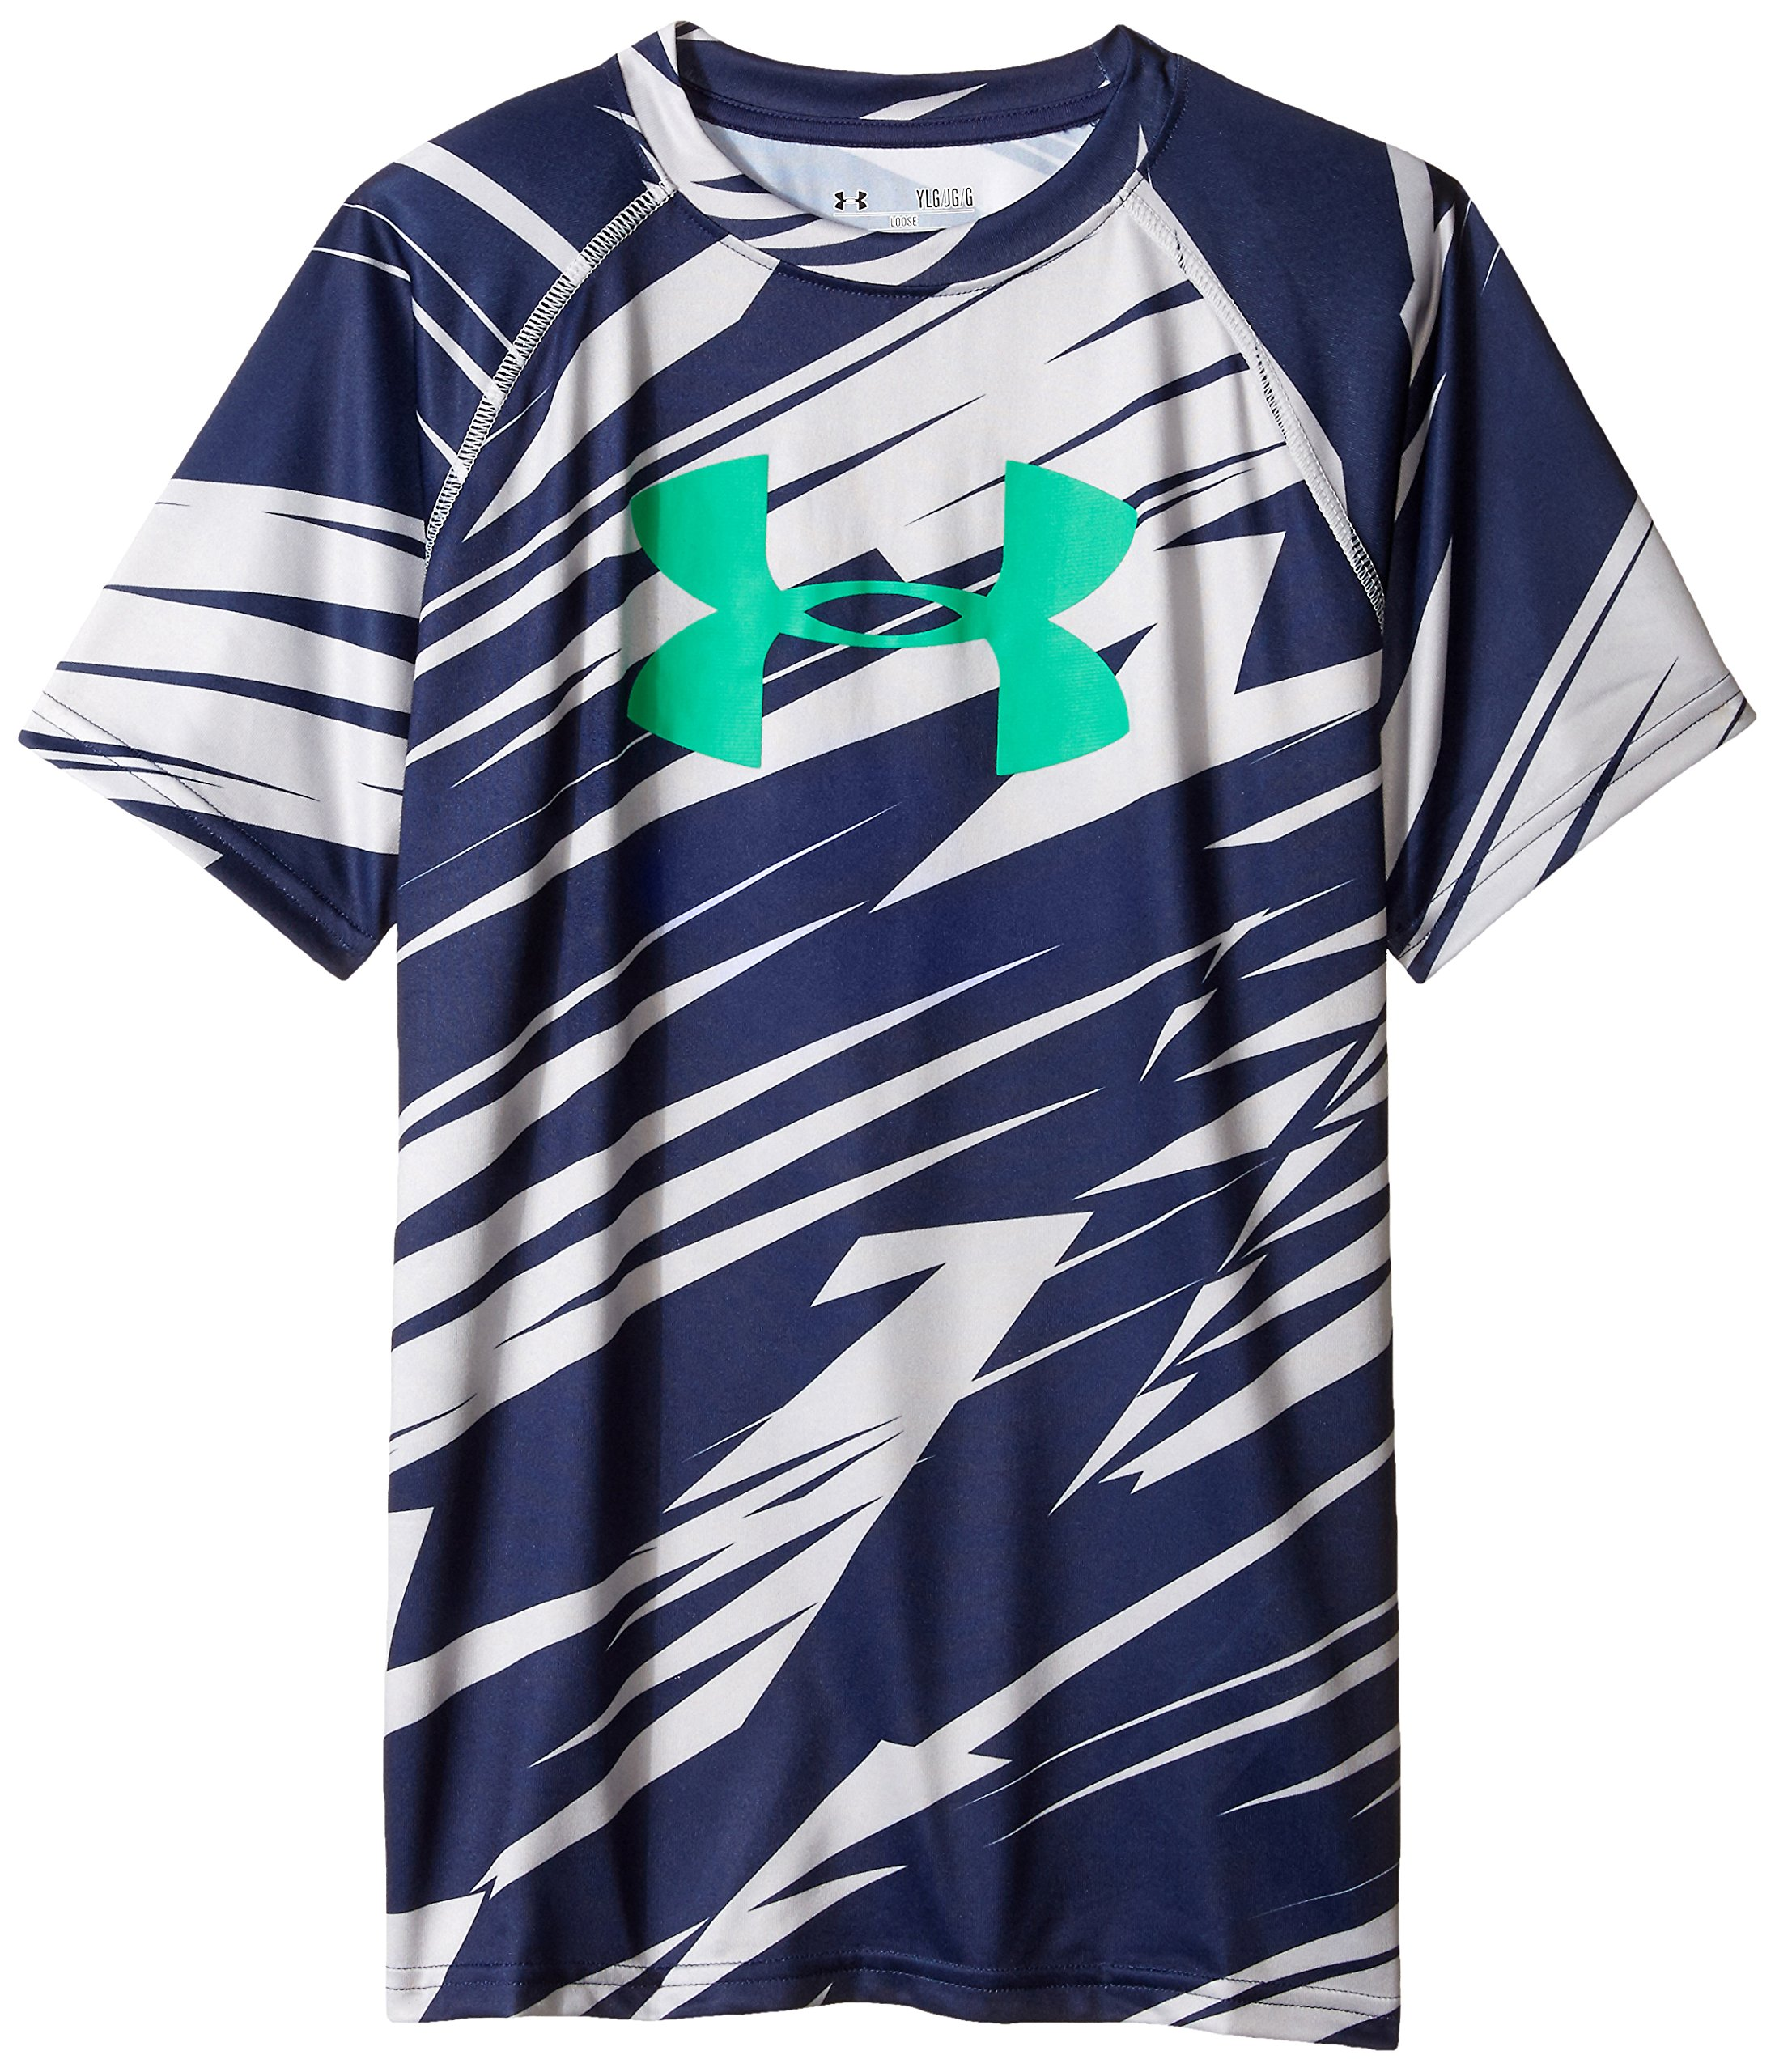 Under Armour Boys' Tech Big Logo Printed Short Sleeve T-Shirt, Steel /Jade, Youth X-Small